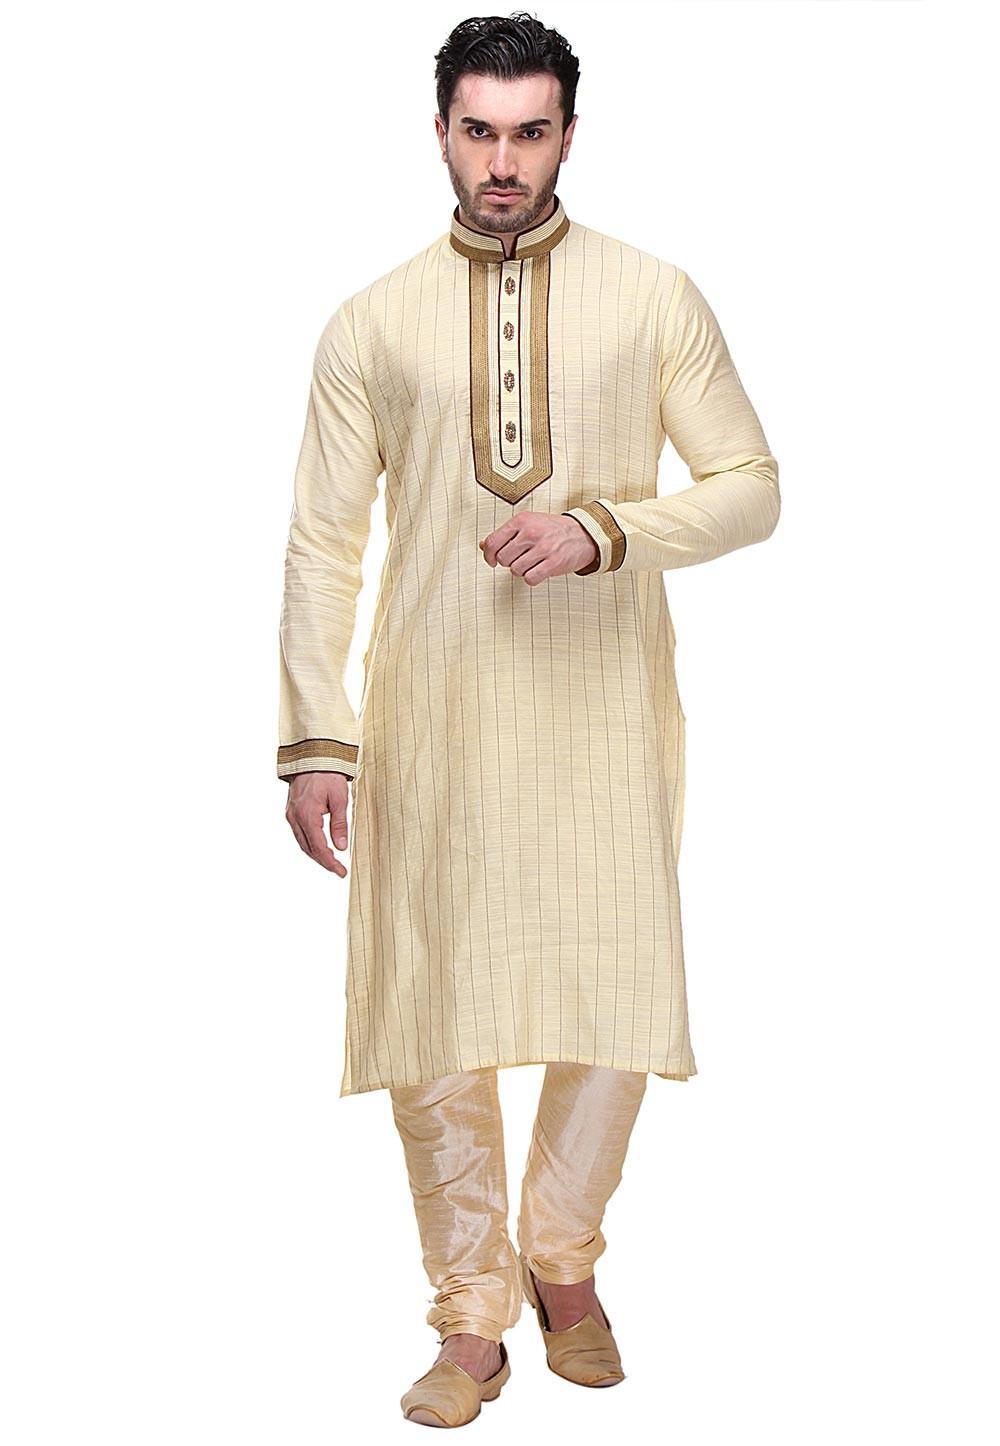 Exquisite Golden Color Readymade Kurta Pajama.